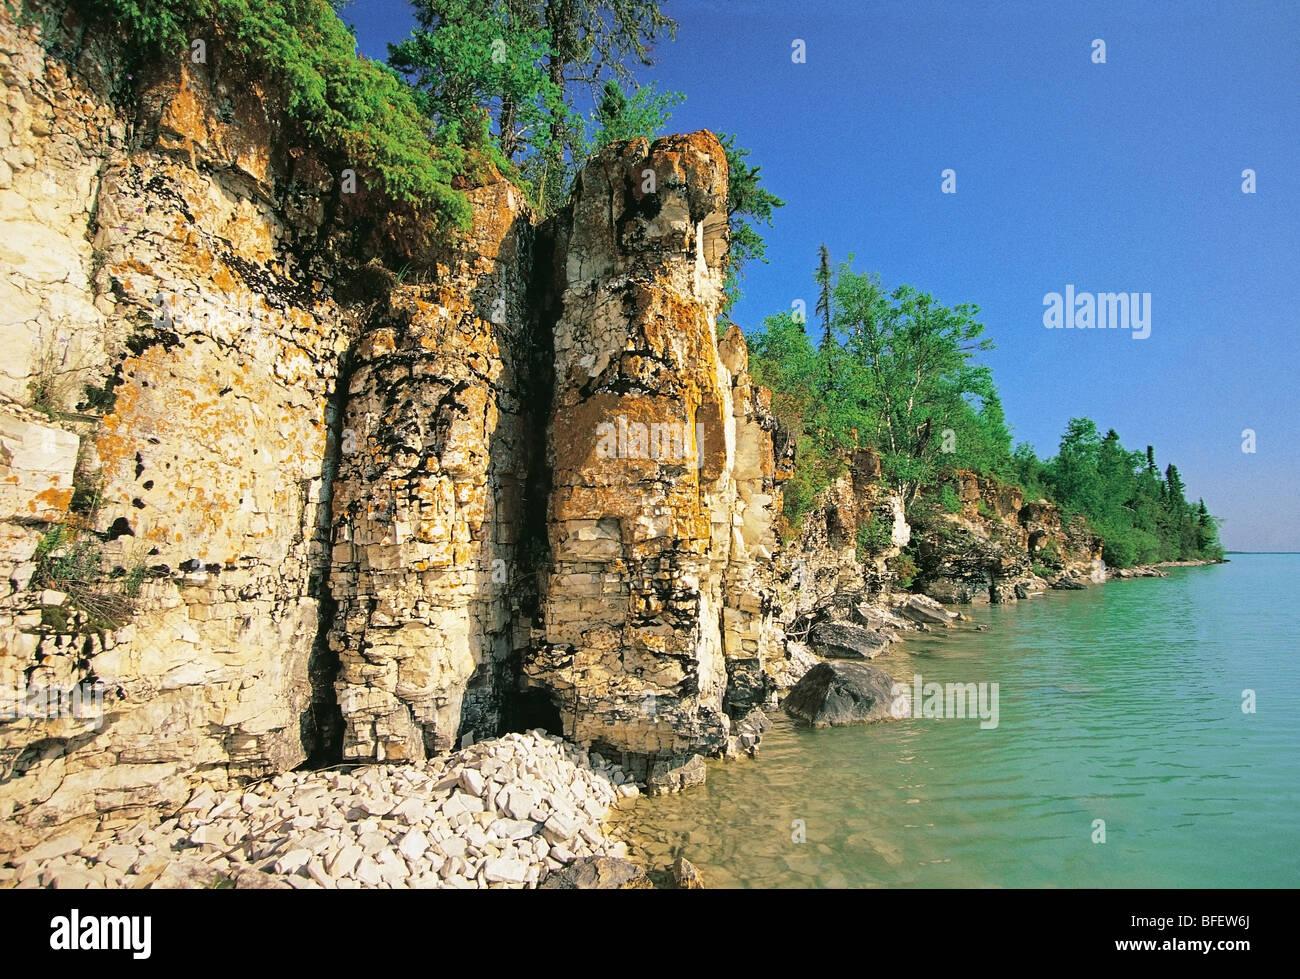 Limestone cliffs along Little Limestone Lake Park Reserve, Manitoba, Canada - Stock Image